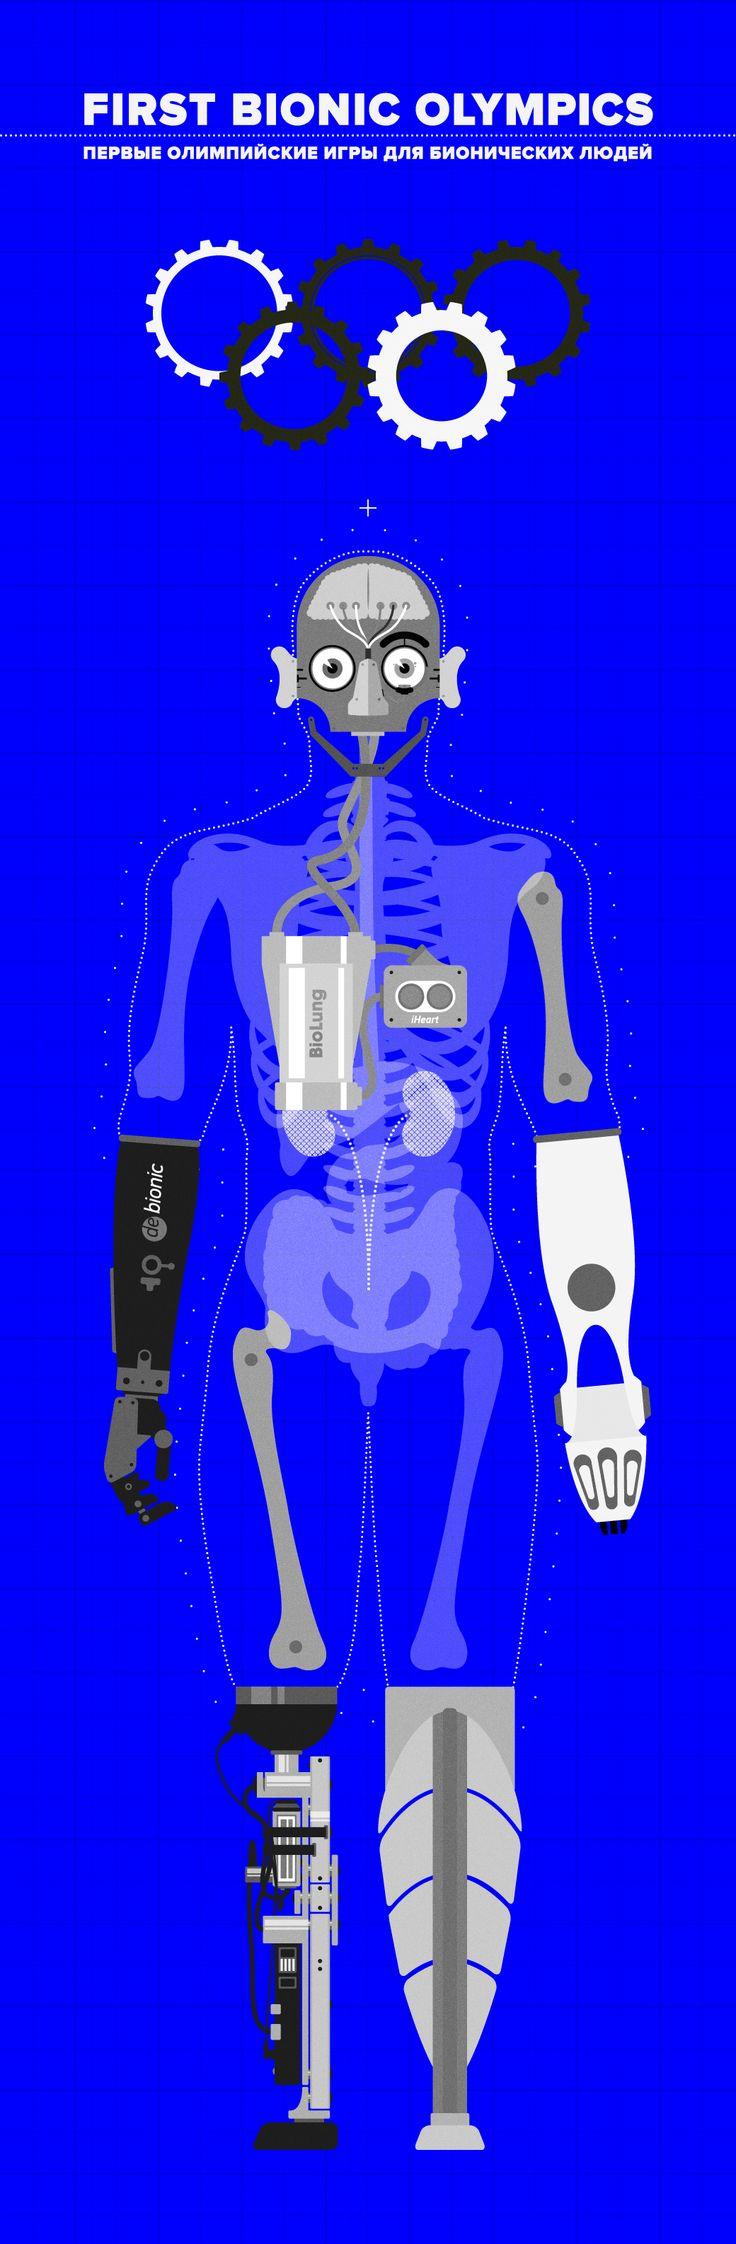 bionic | future | robots | human | sci-fi | sport | olympics | look at me